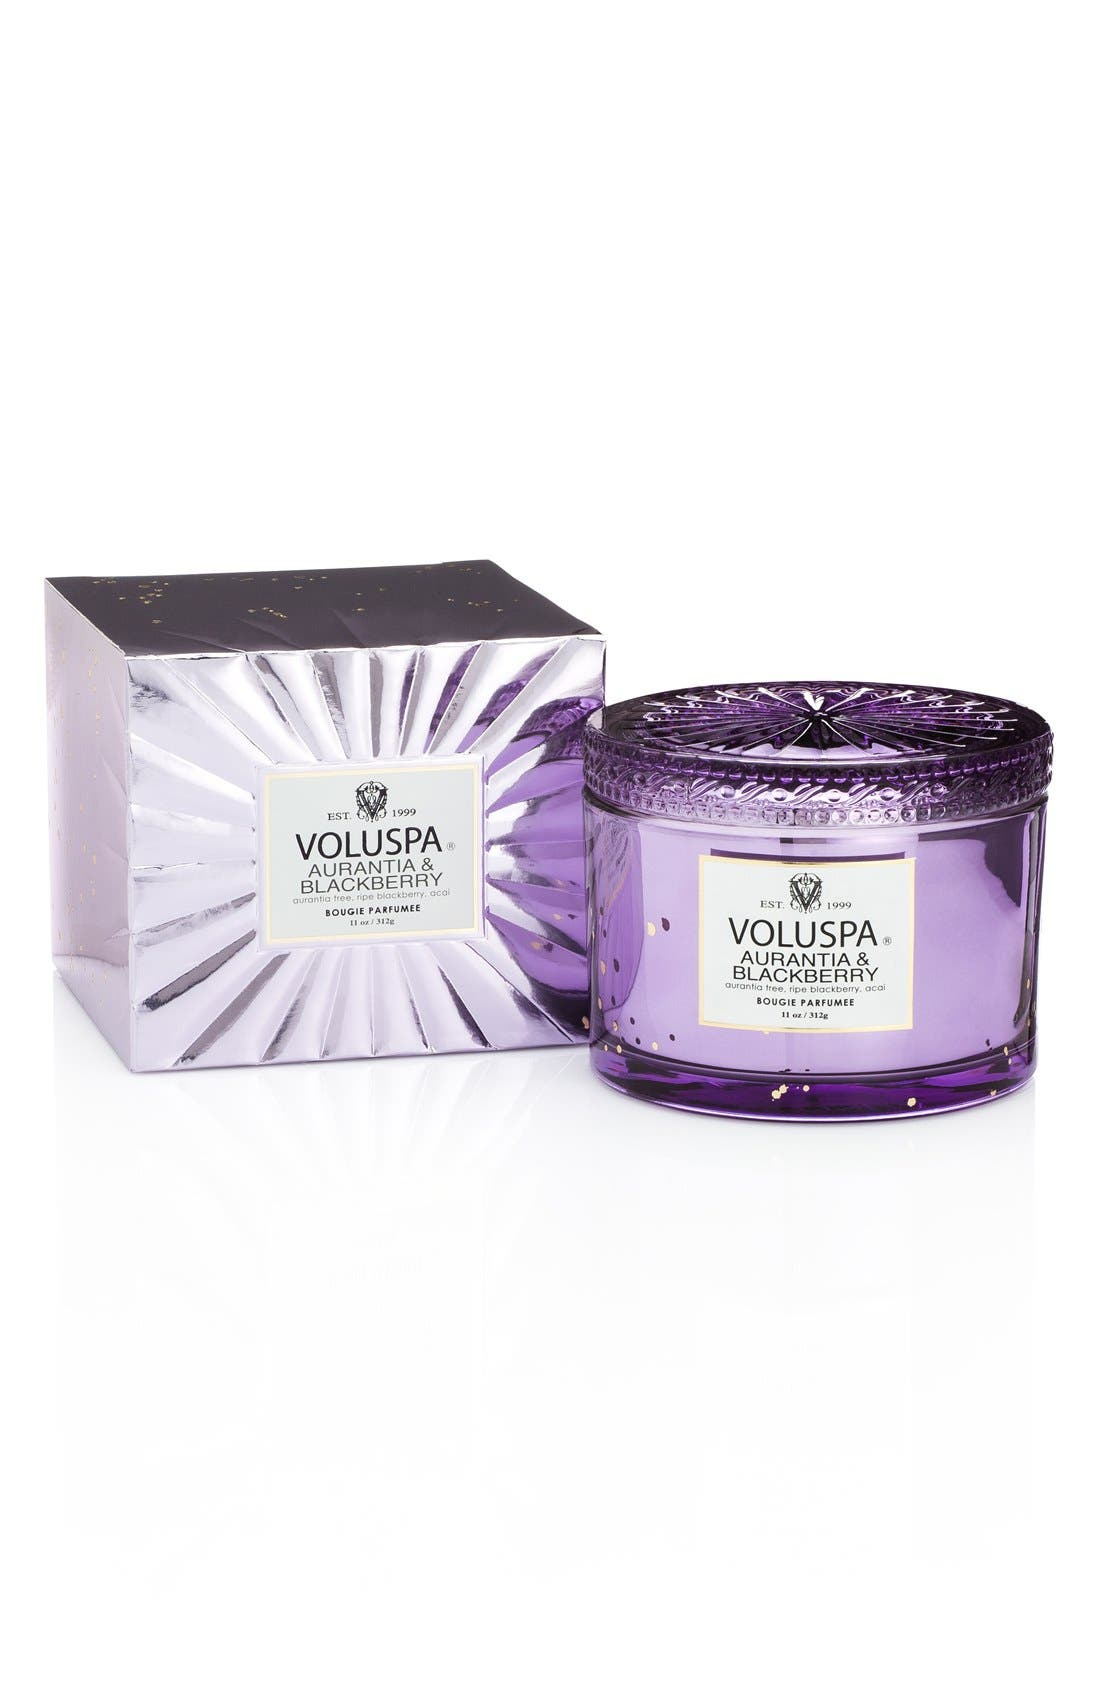 Voluspa 'Maison Blanc - Aurantia & Blackberry' Boxed Lidded Candle